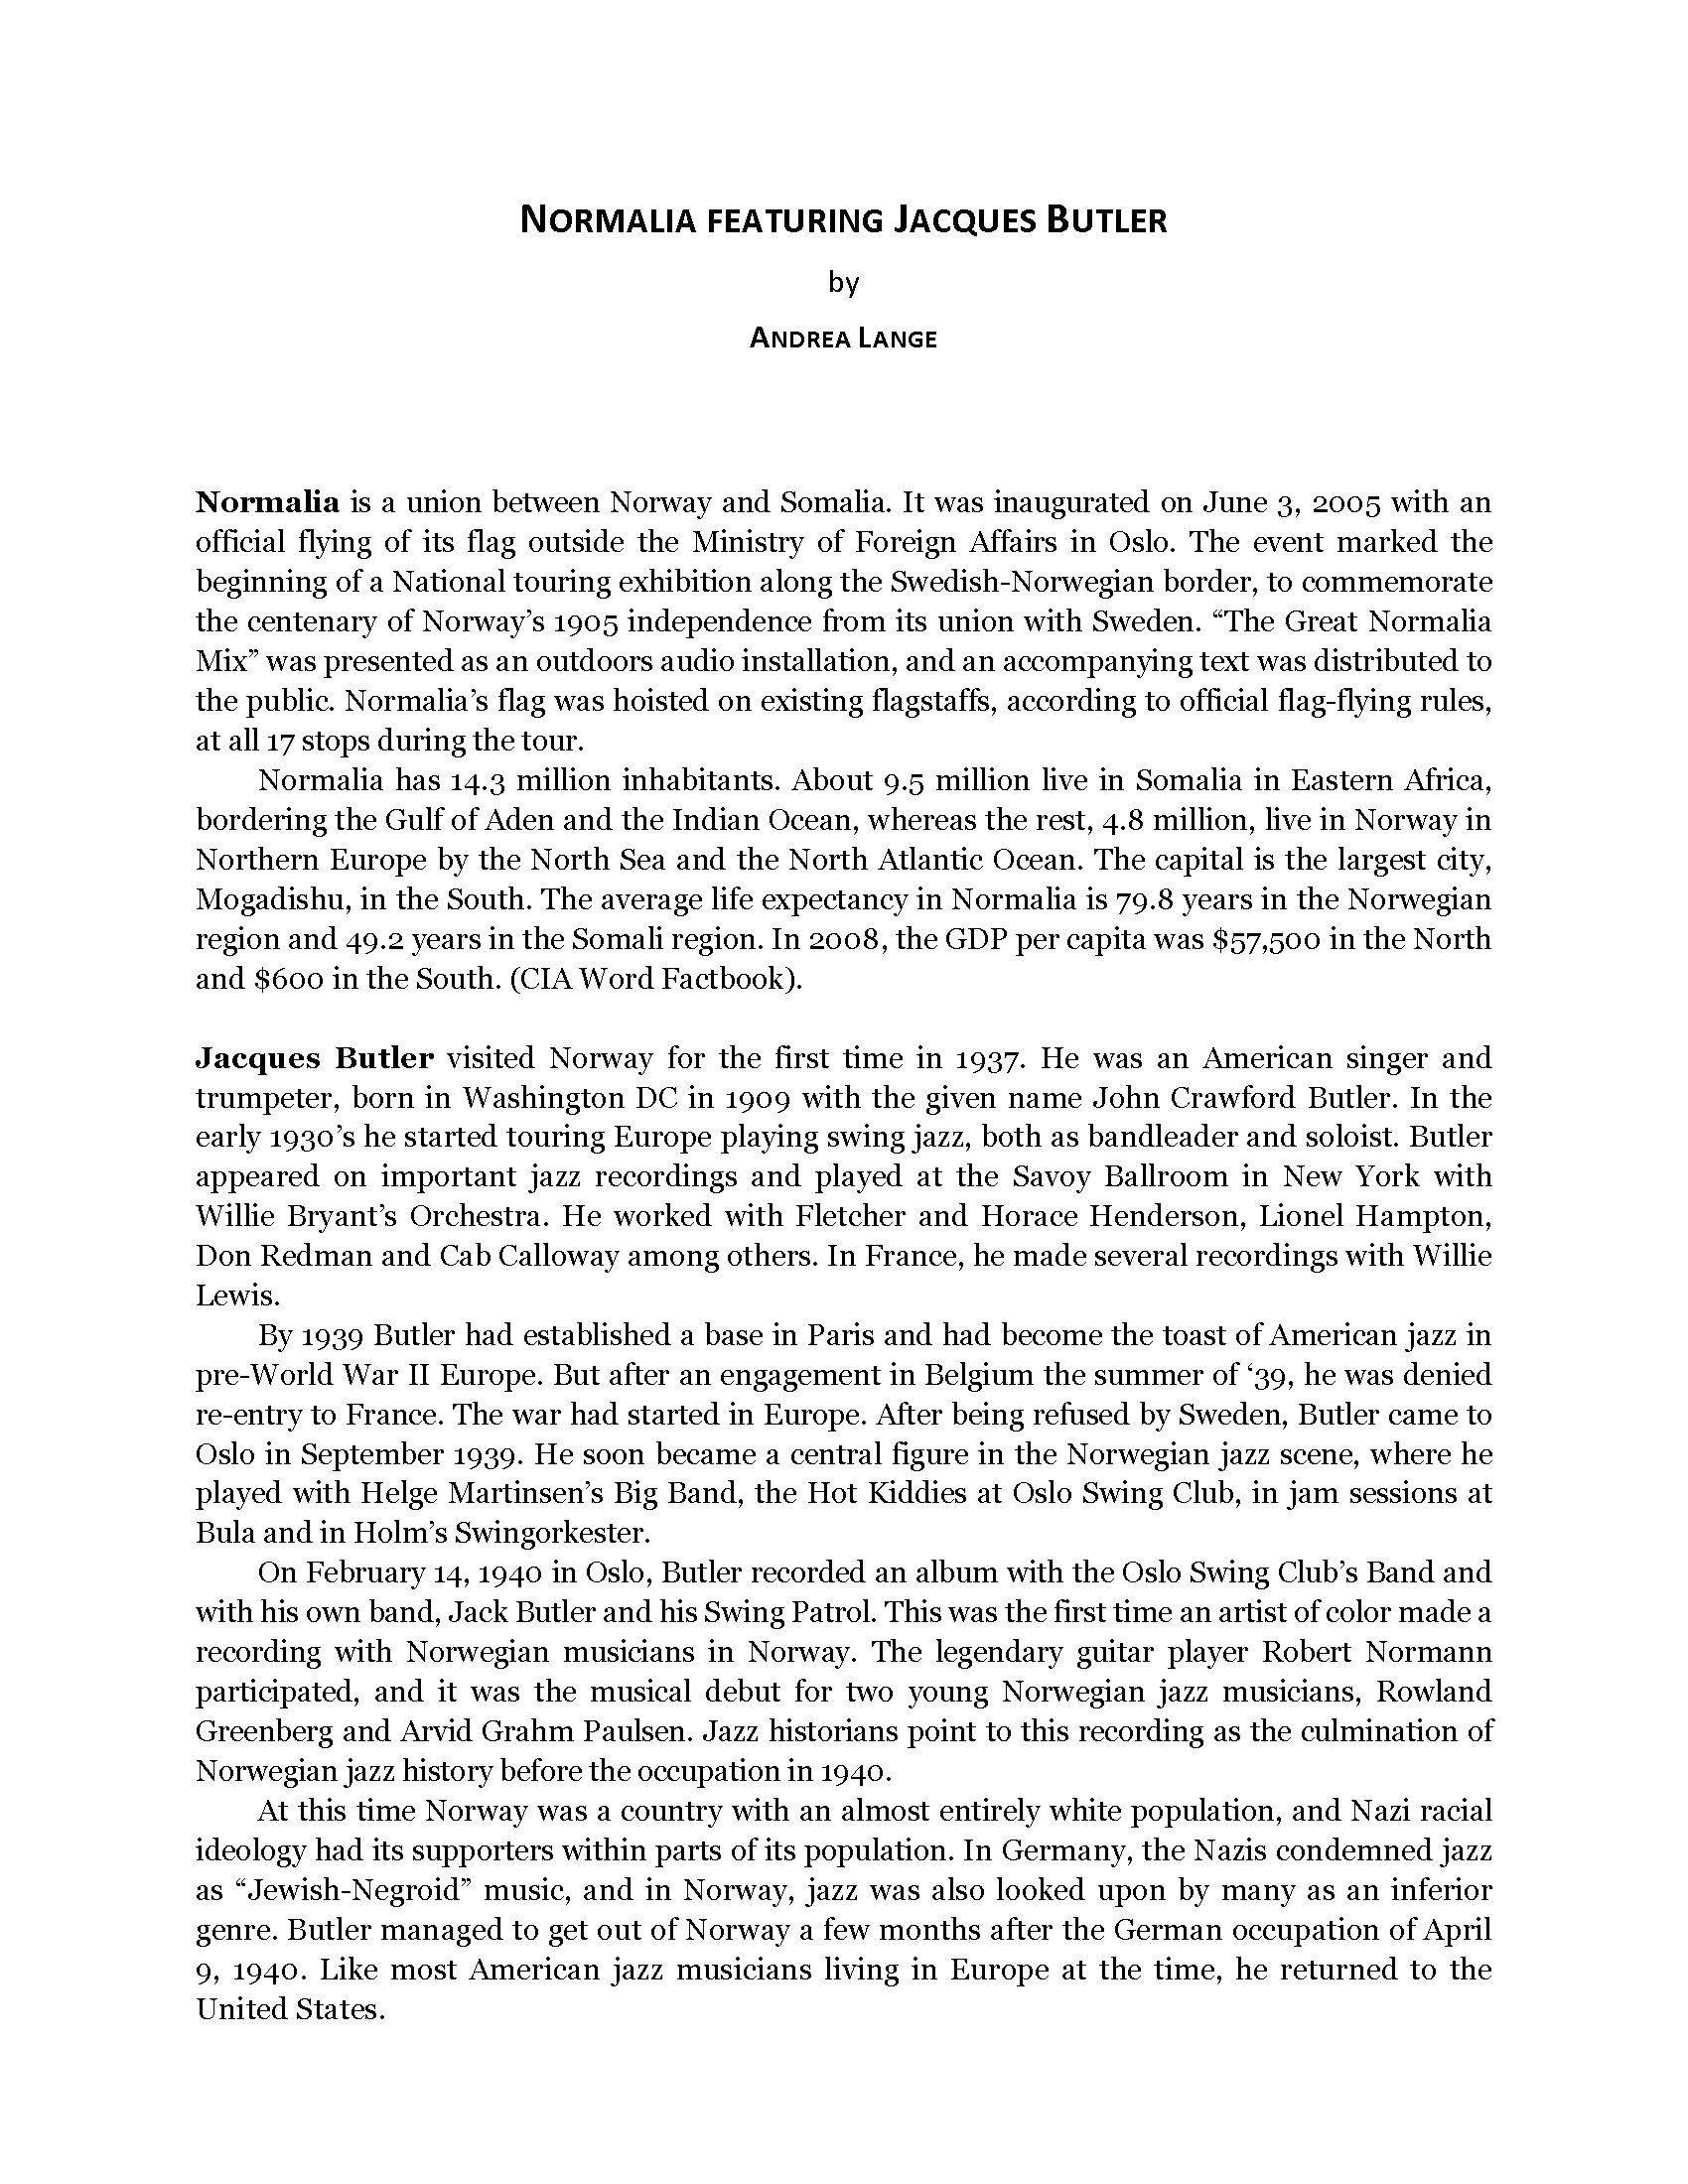 Lange-Boktekst _Normalia featuring Jacques Butler_Page_1.jpg